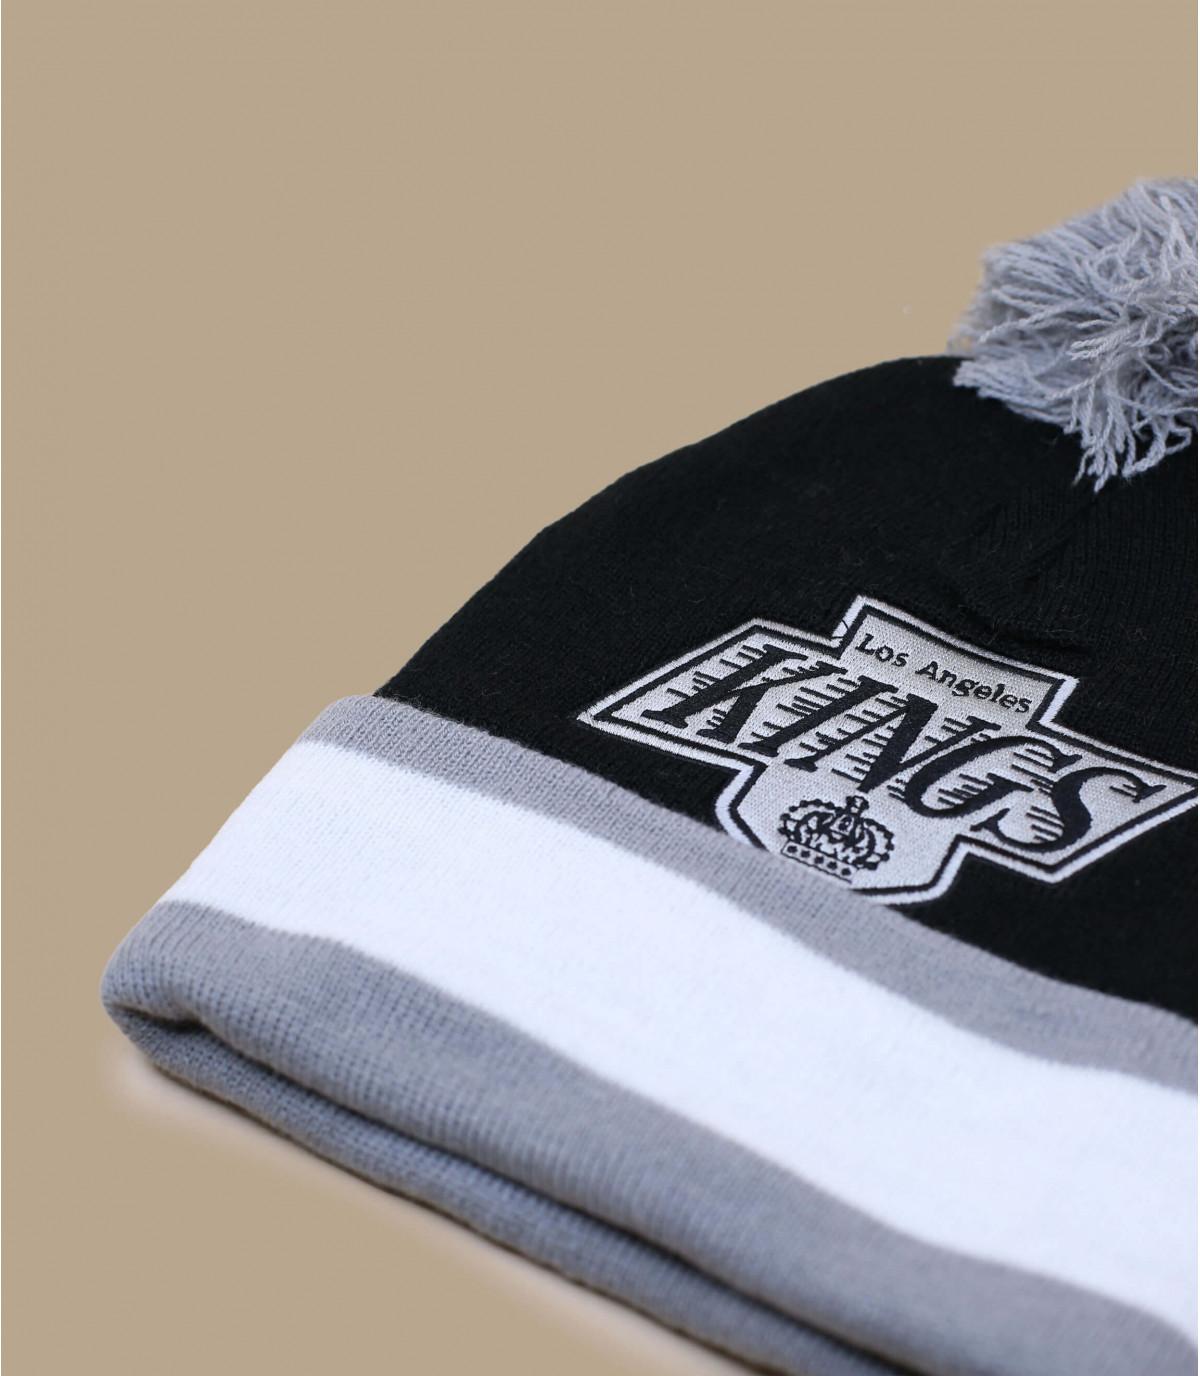 Gorro kings jersey - Gorro Kings jersey de Mitchell   Ness. Headict 7facaf26976